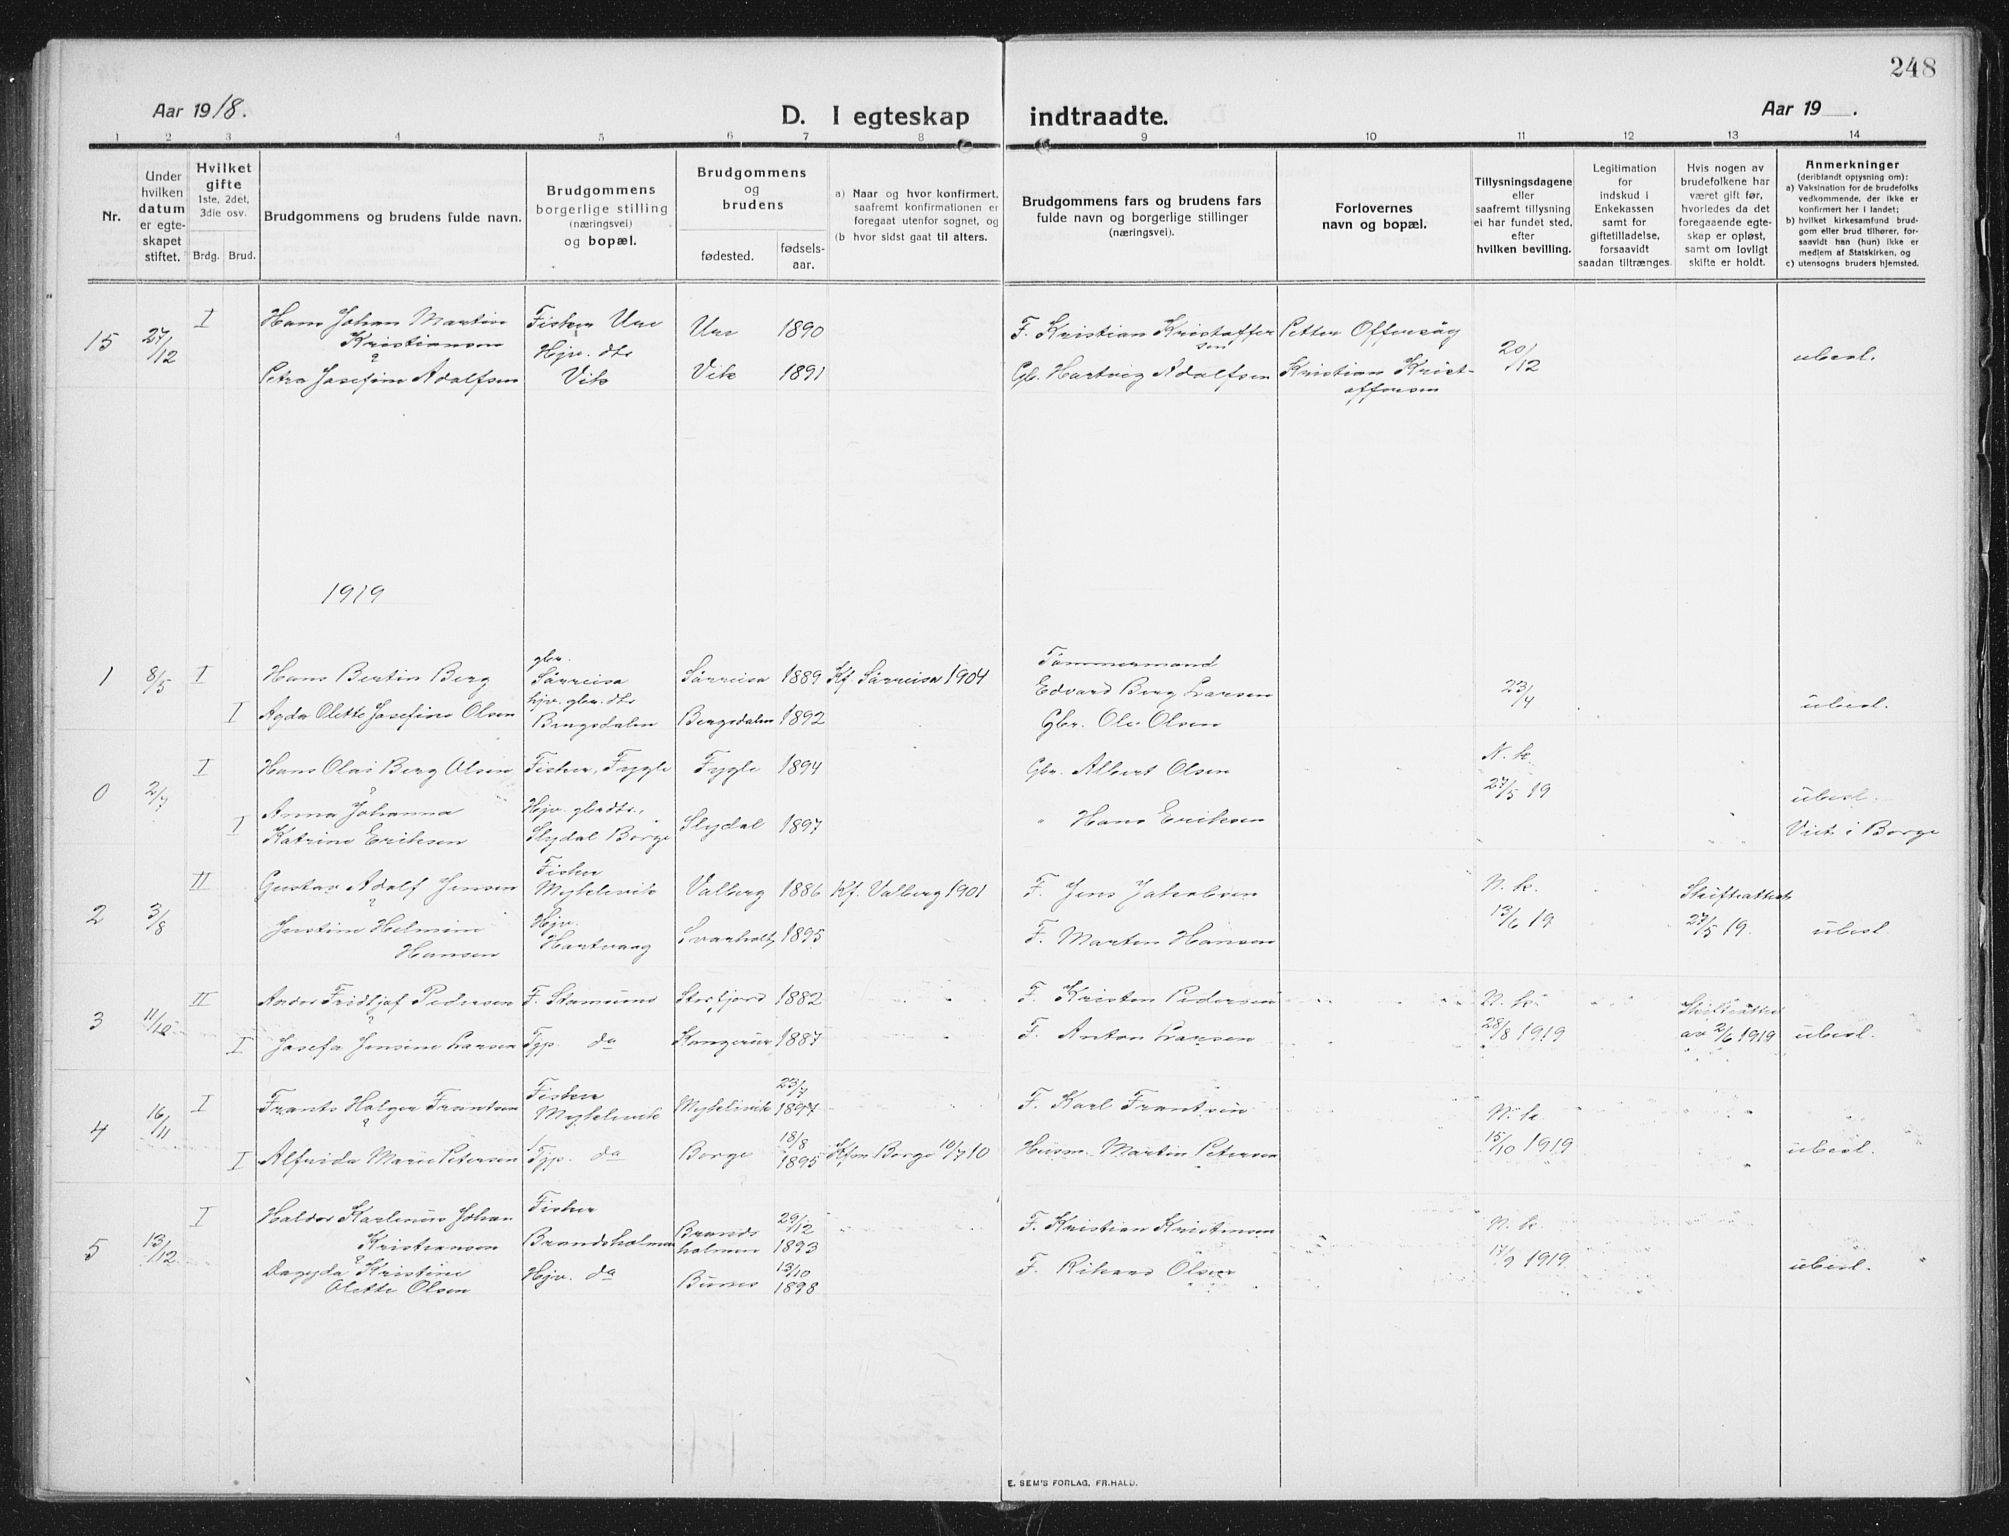 SAT, Ministerialprotokoller, klokkerbøker og fødselsregistre - Nordland, 882/L1183: Klokkerbok nr. 882C01, 1911-1938, s. 248